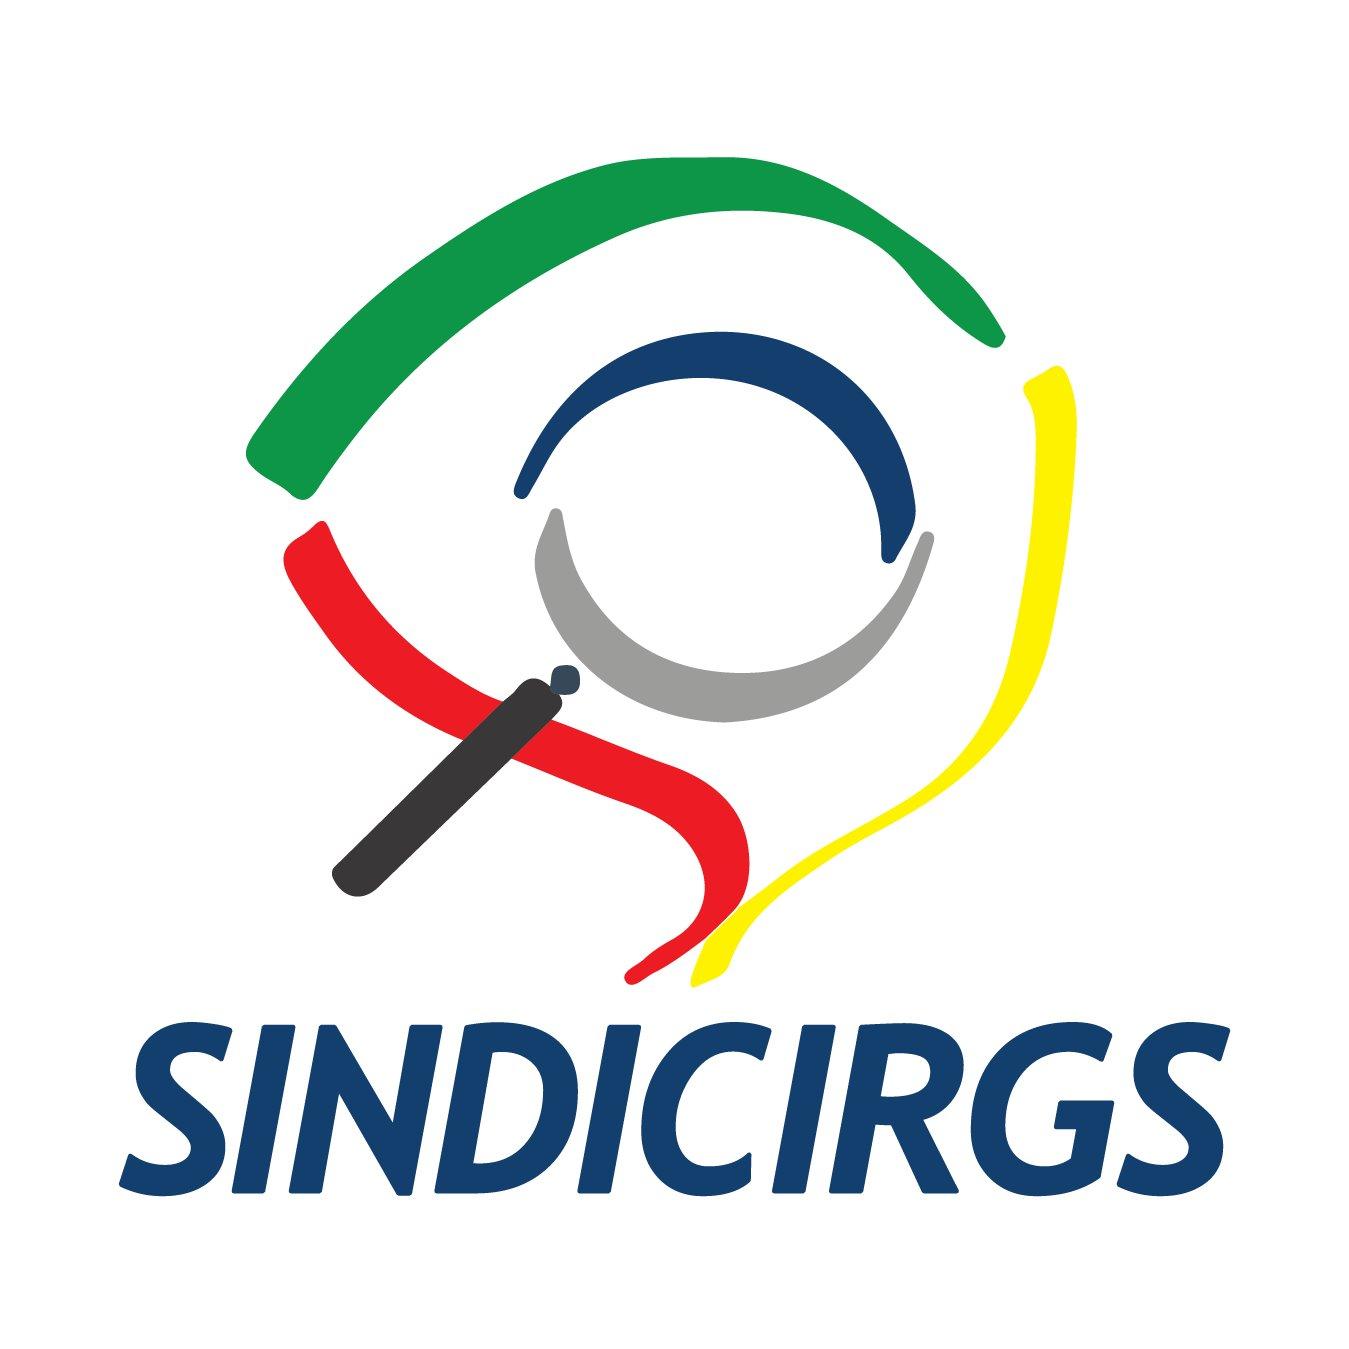 SINDICIRGS